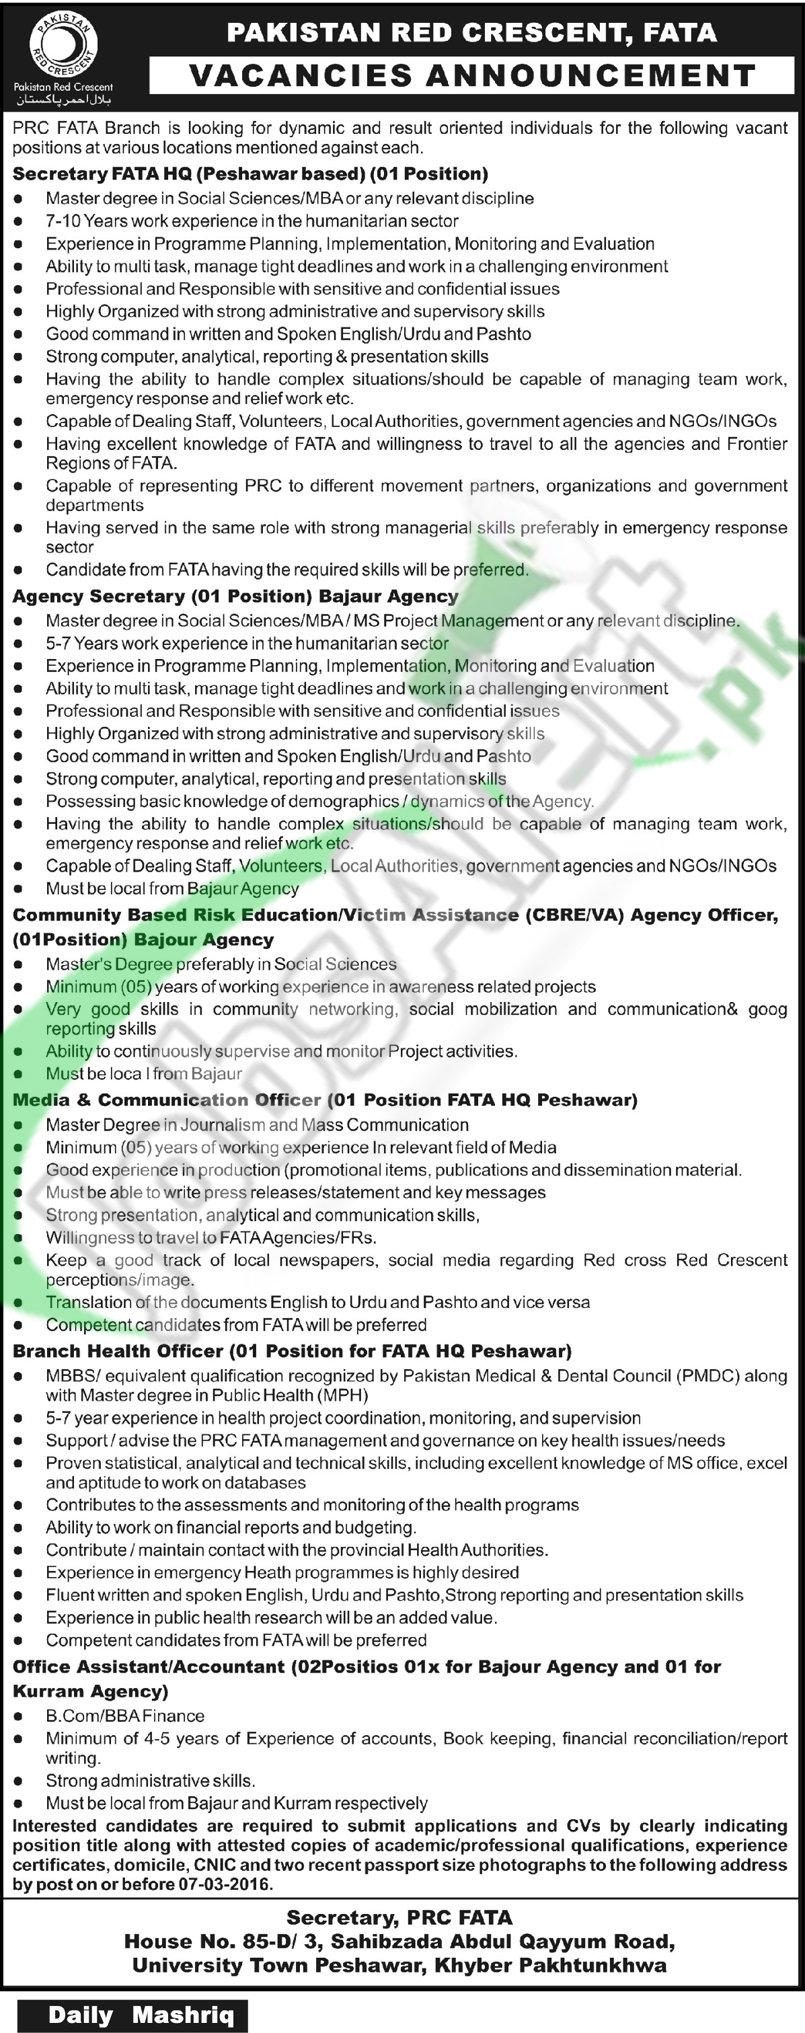 Employment Offers is Pakistan Red Crescent 2016 FATA HQ Peshawar, Bajaur Agency Latest Advertisement